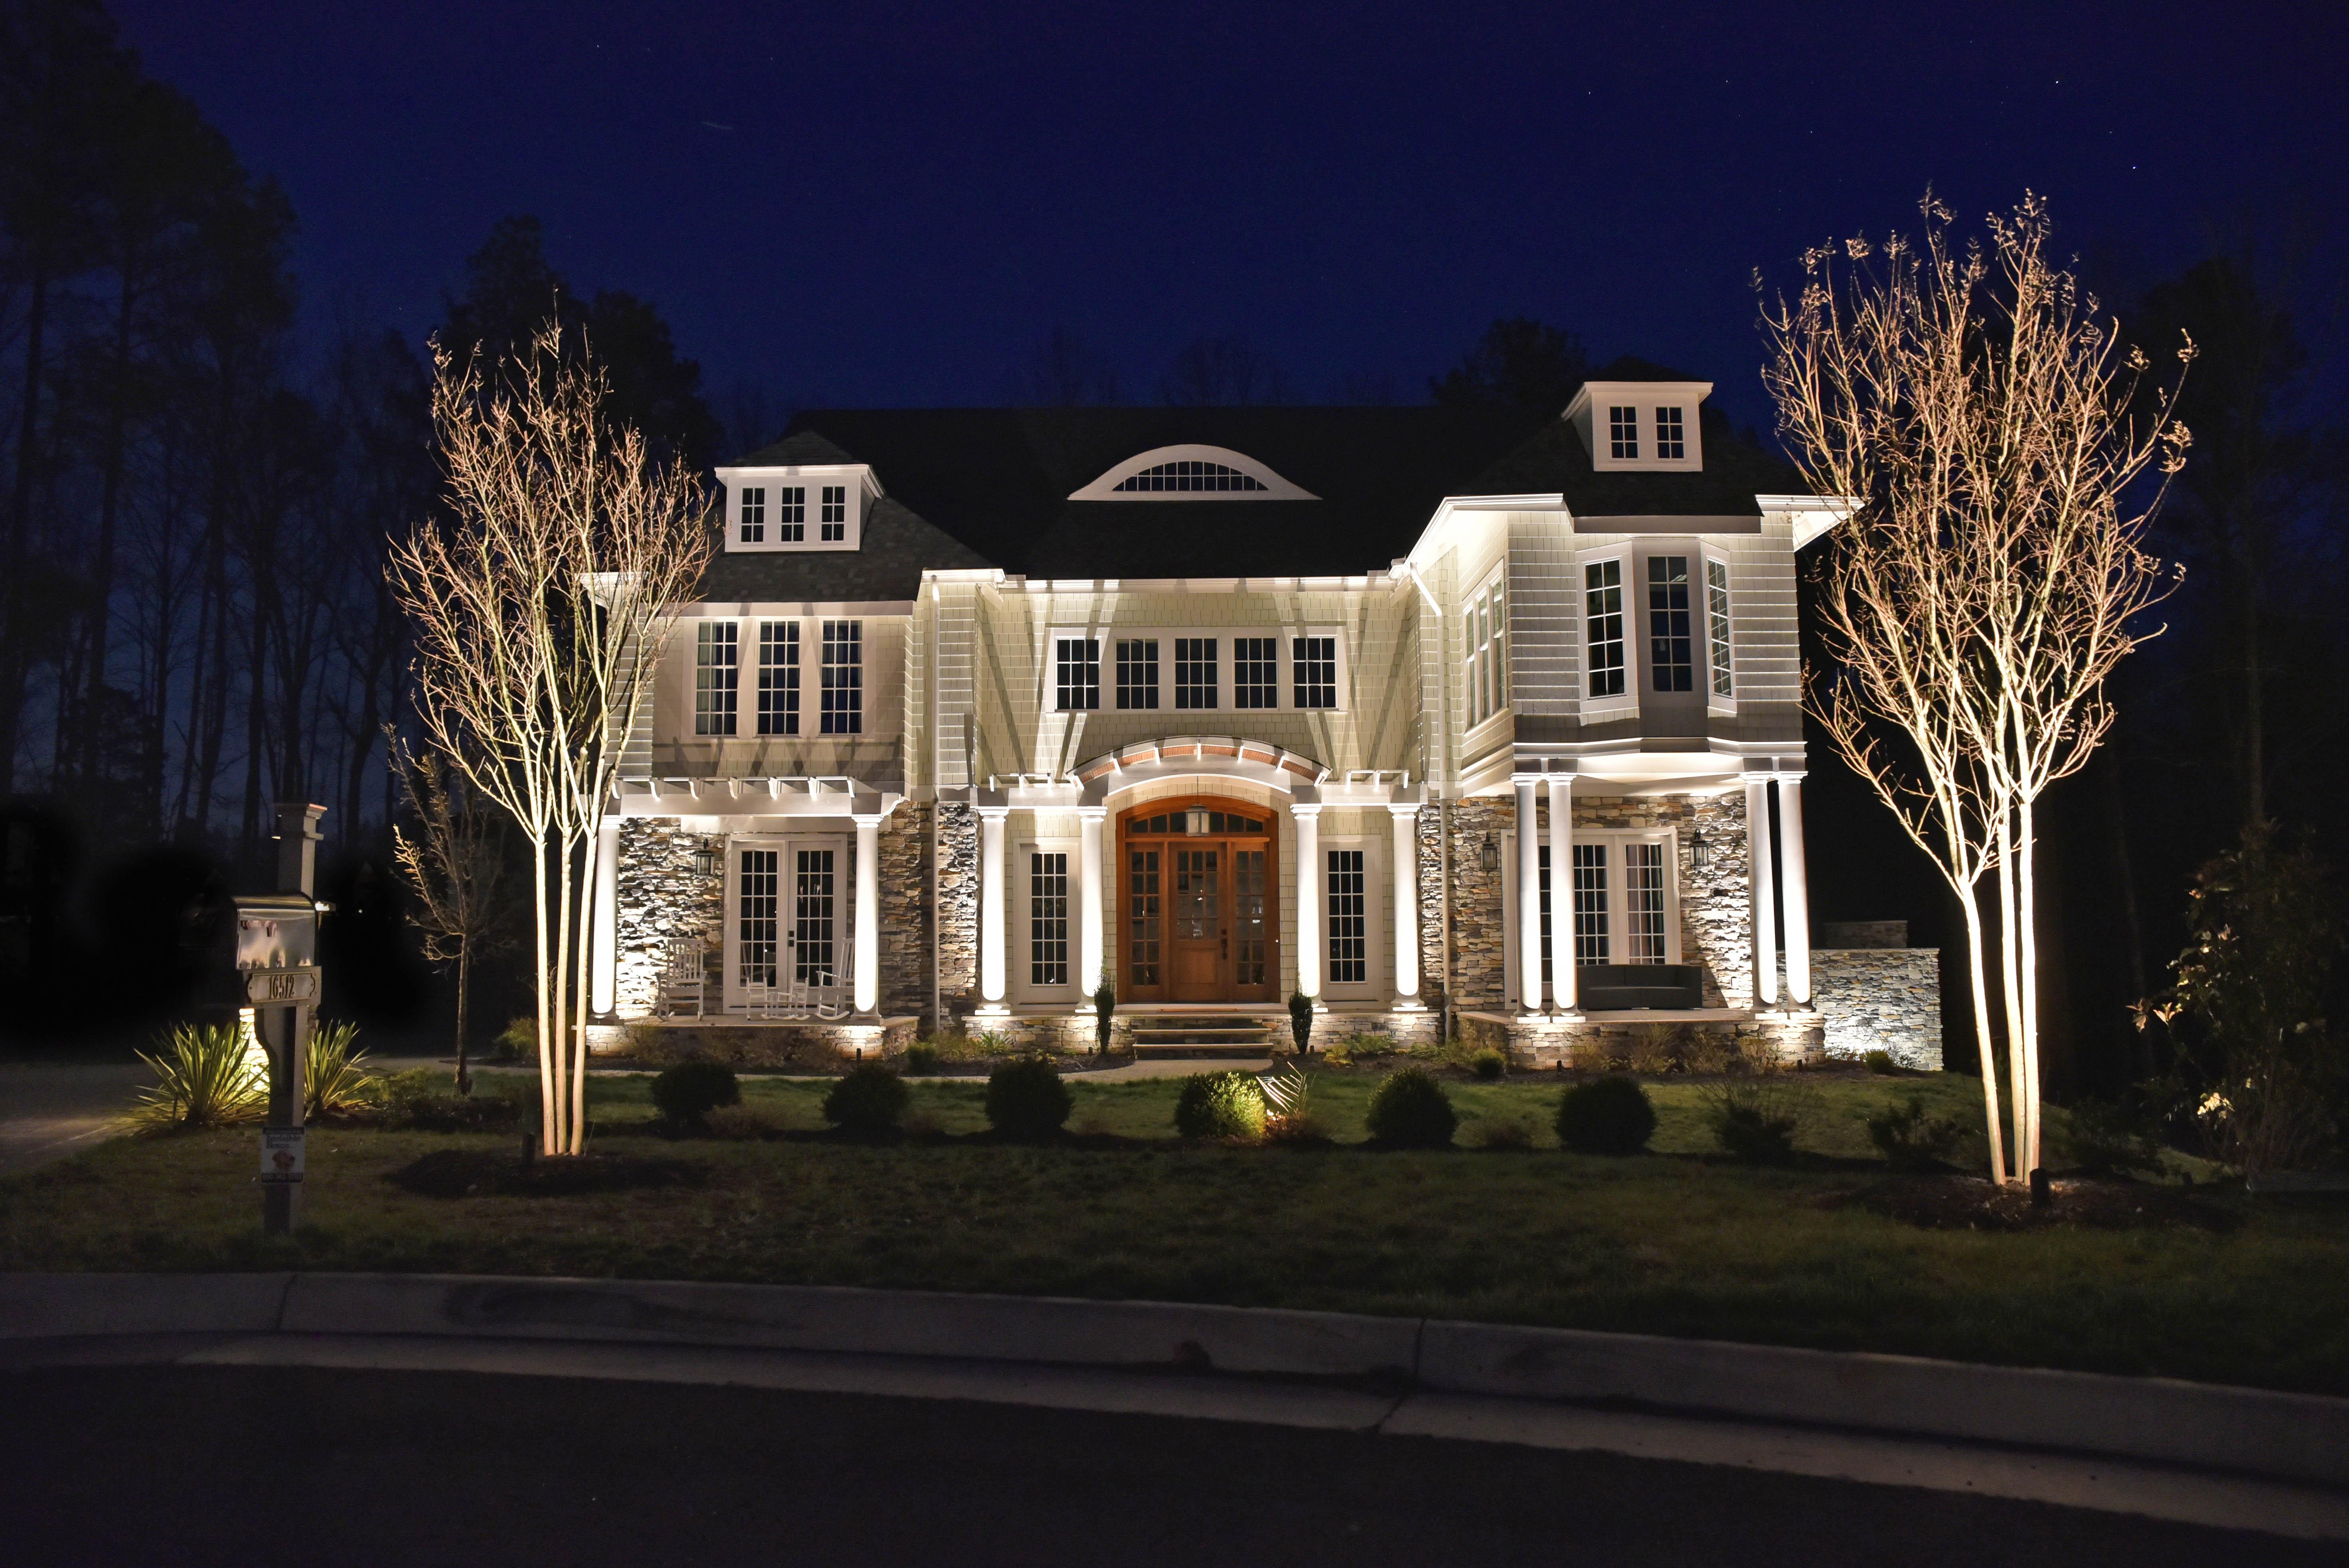 free nighttime lighting demonstration